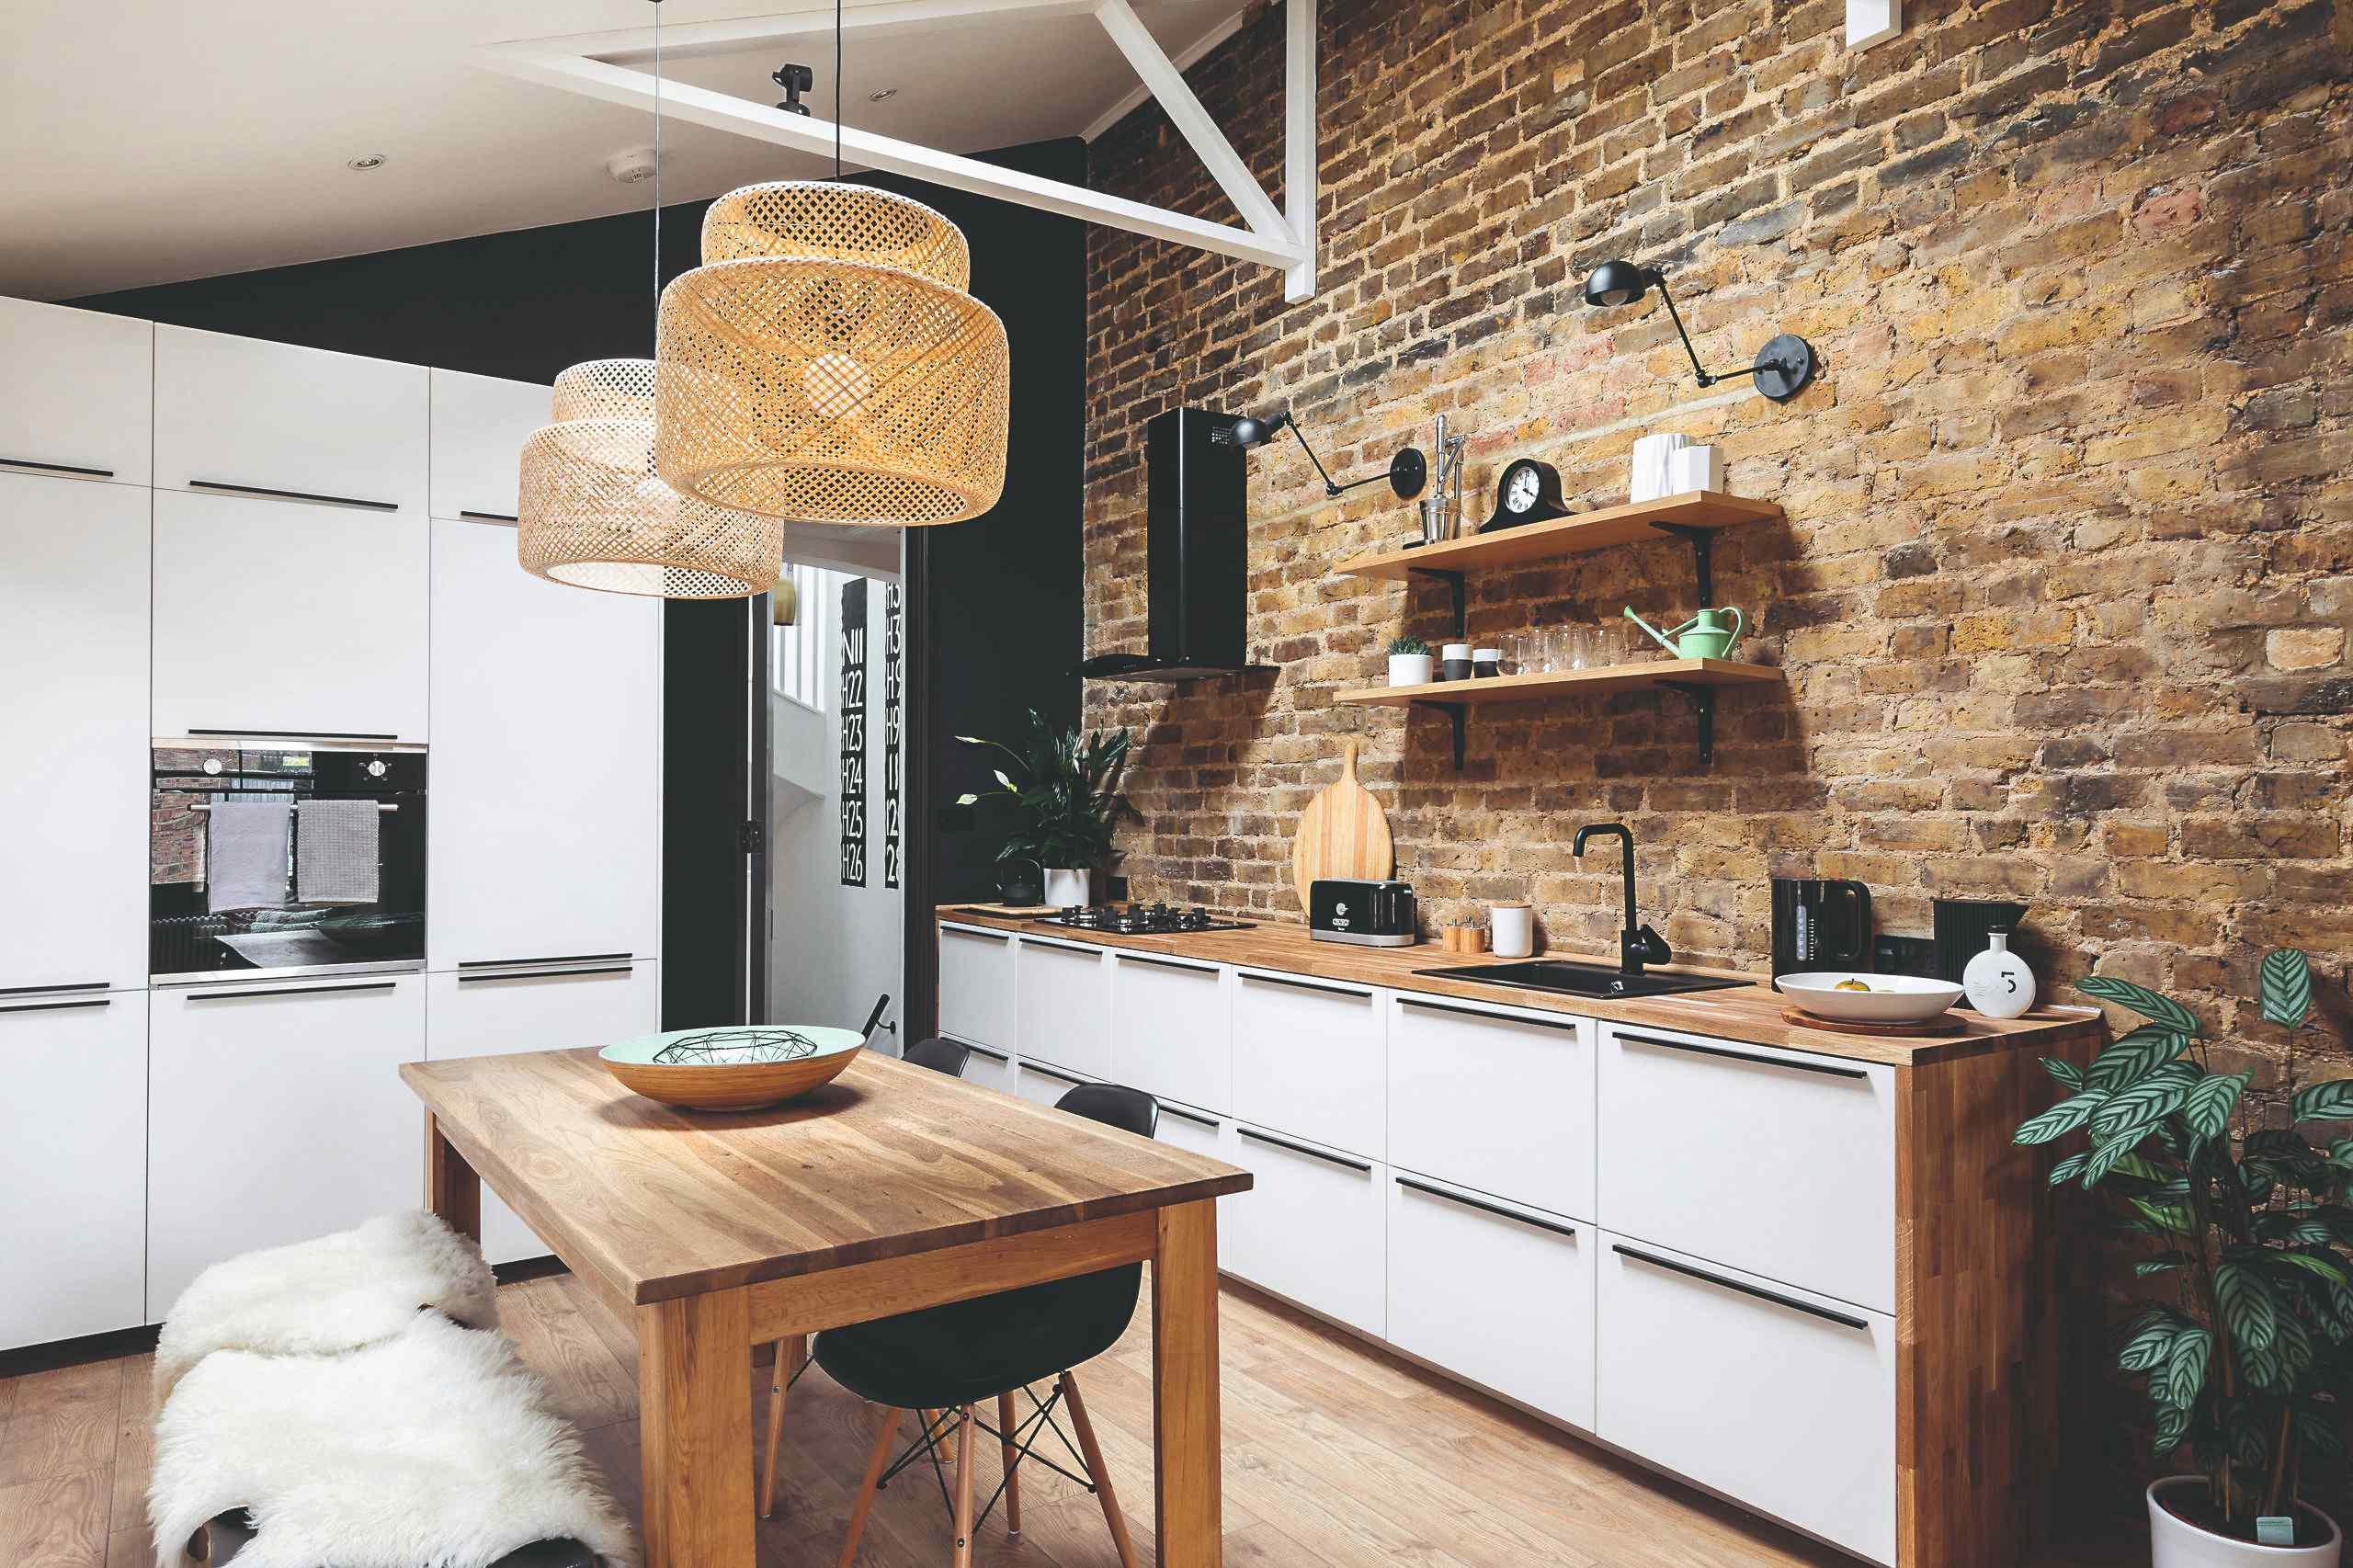 Kuchyňa s dreveným stolom a tehlovou stenou